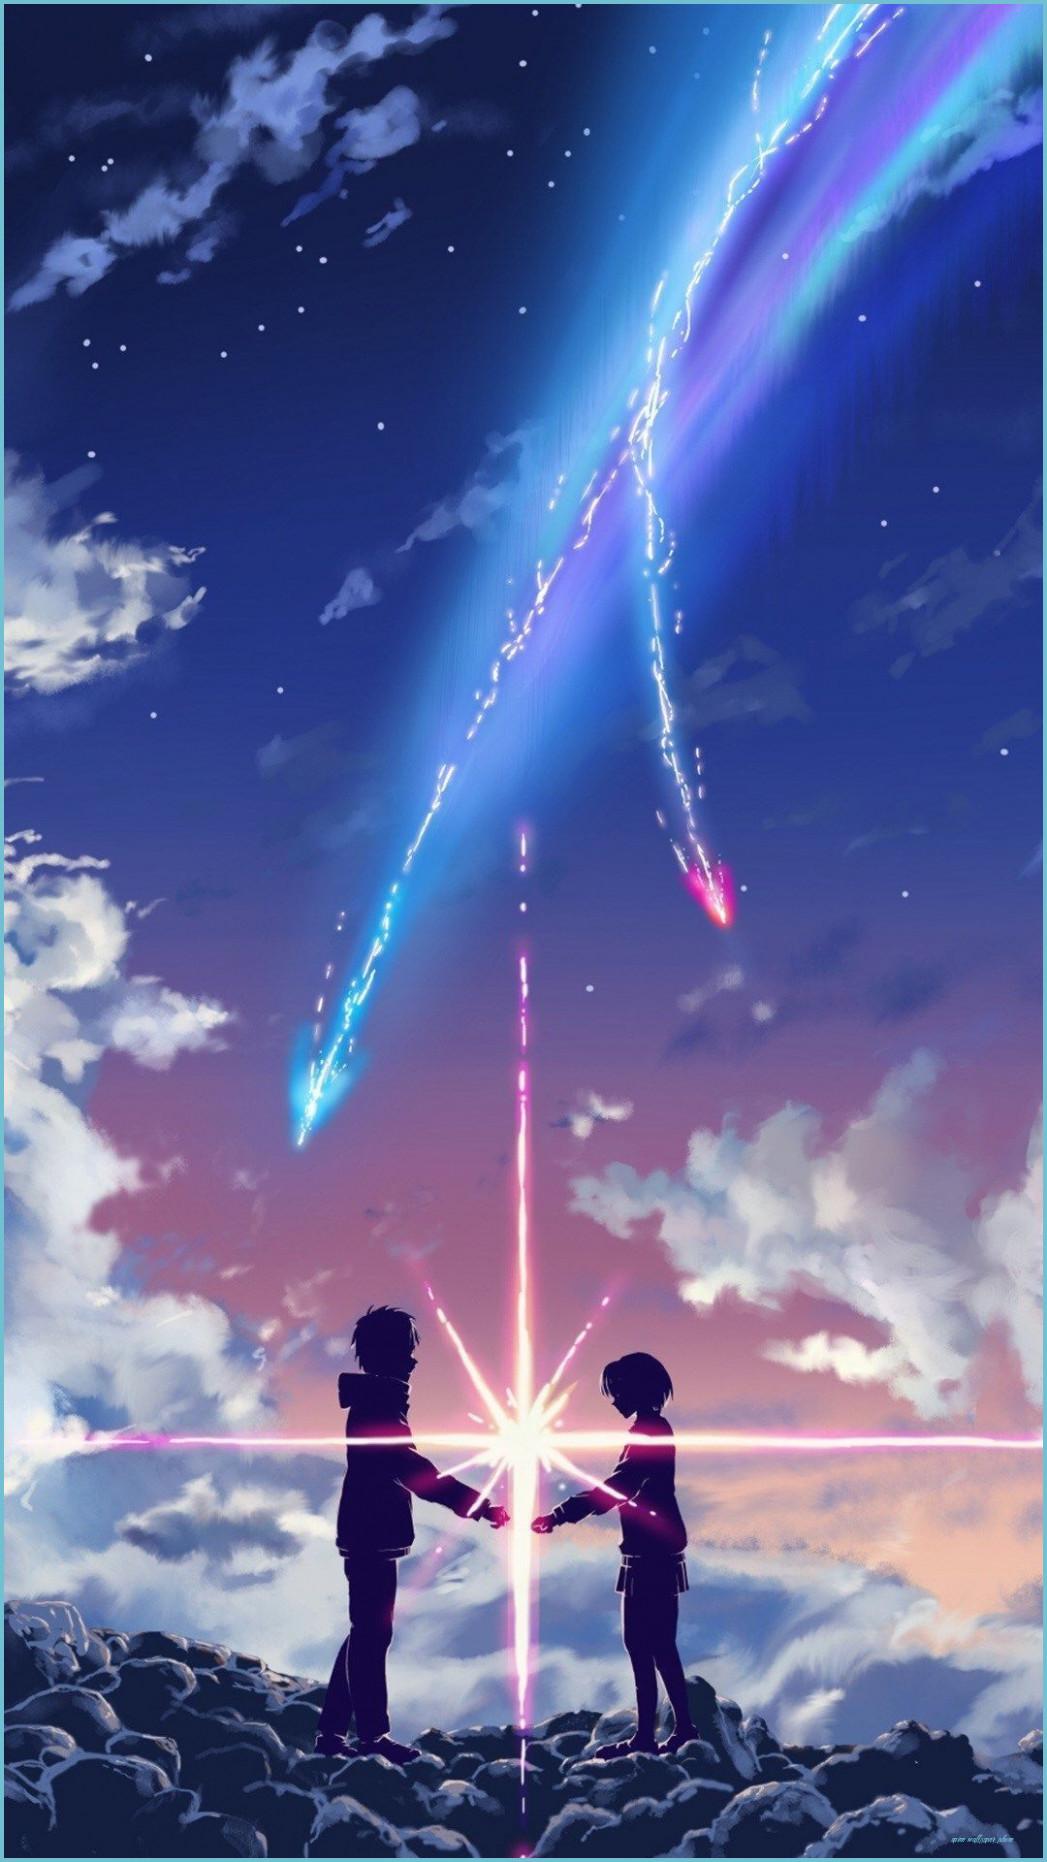 Aesthetic Anime Phone Wallpapers   Top Aesthetic Anime Phone 1047x1862